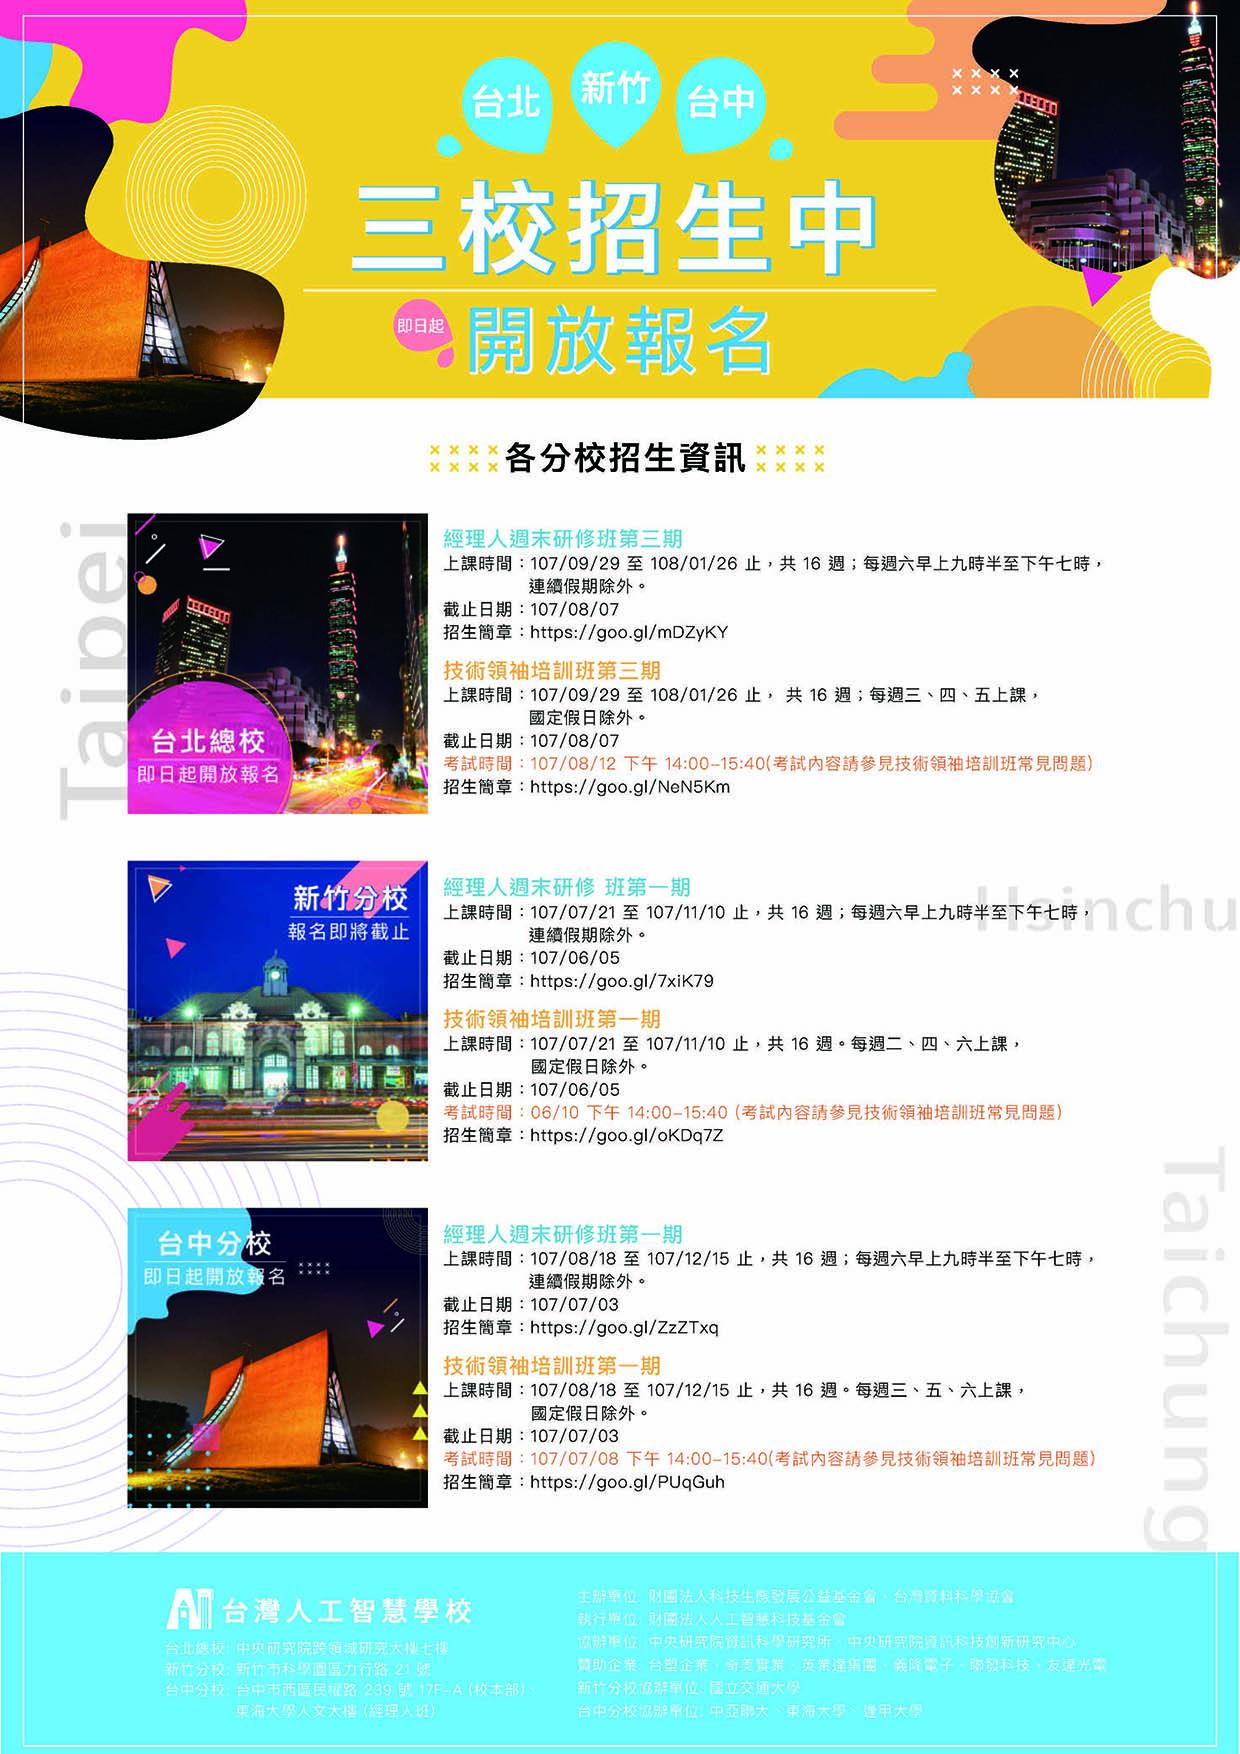 proimages/news/Others/台灣人工智慧學校招生訊息_(1)_頁面_2.jpg